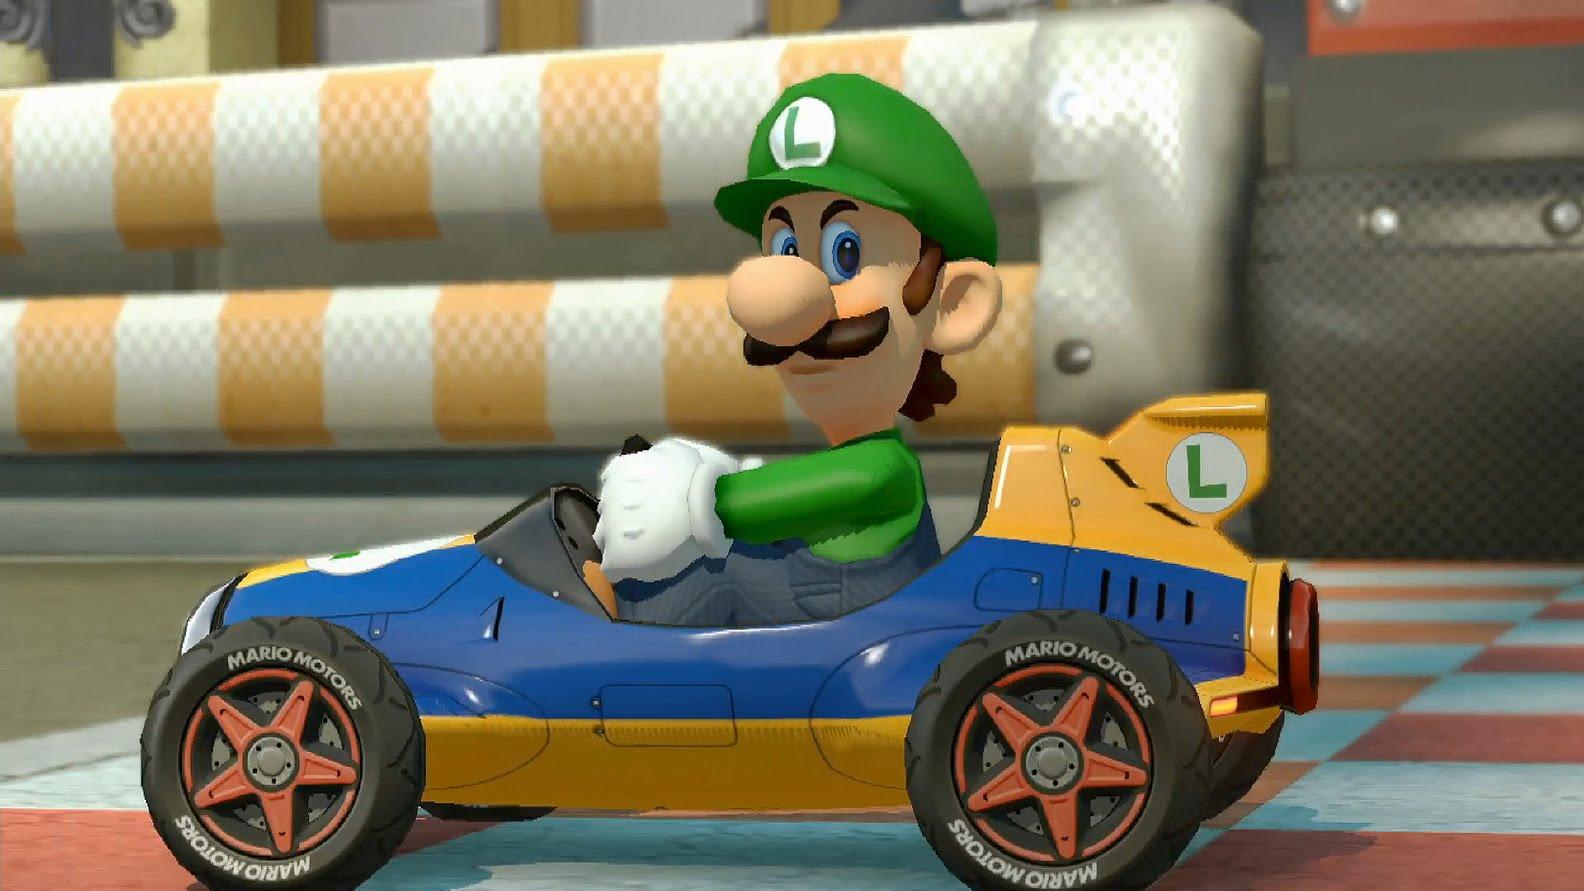 MARI Mobility Development Co. Ltd. ordered to pay Nintendo $460k in Mario Kart lawsuit